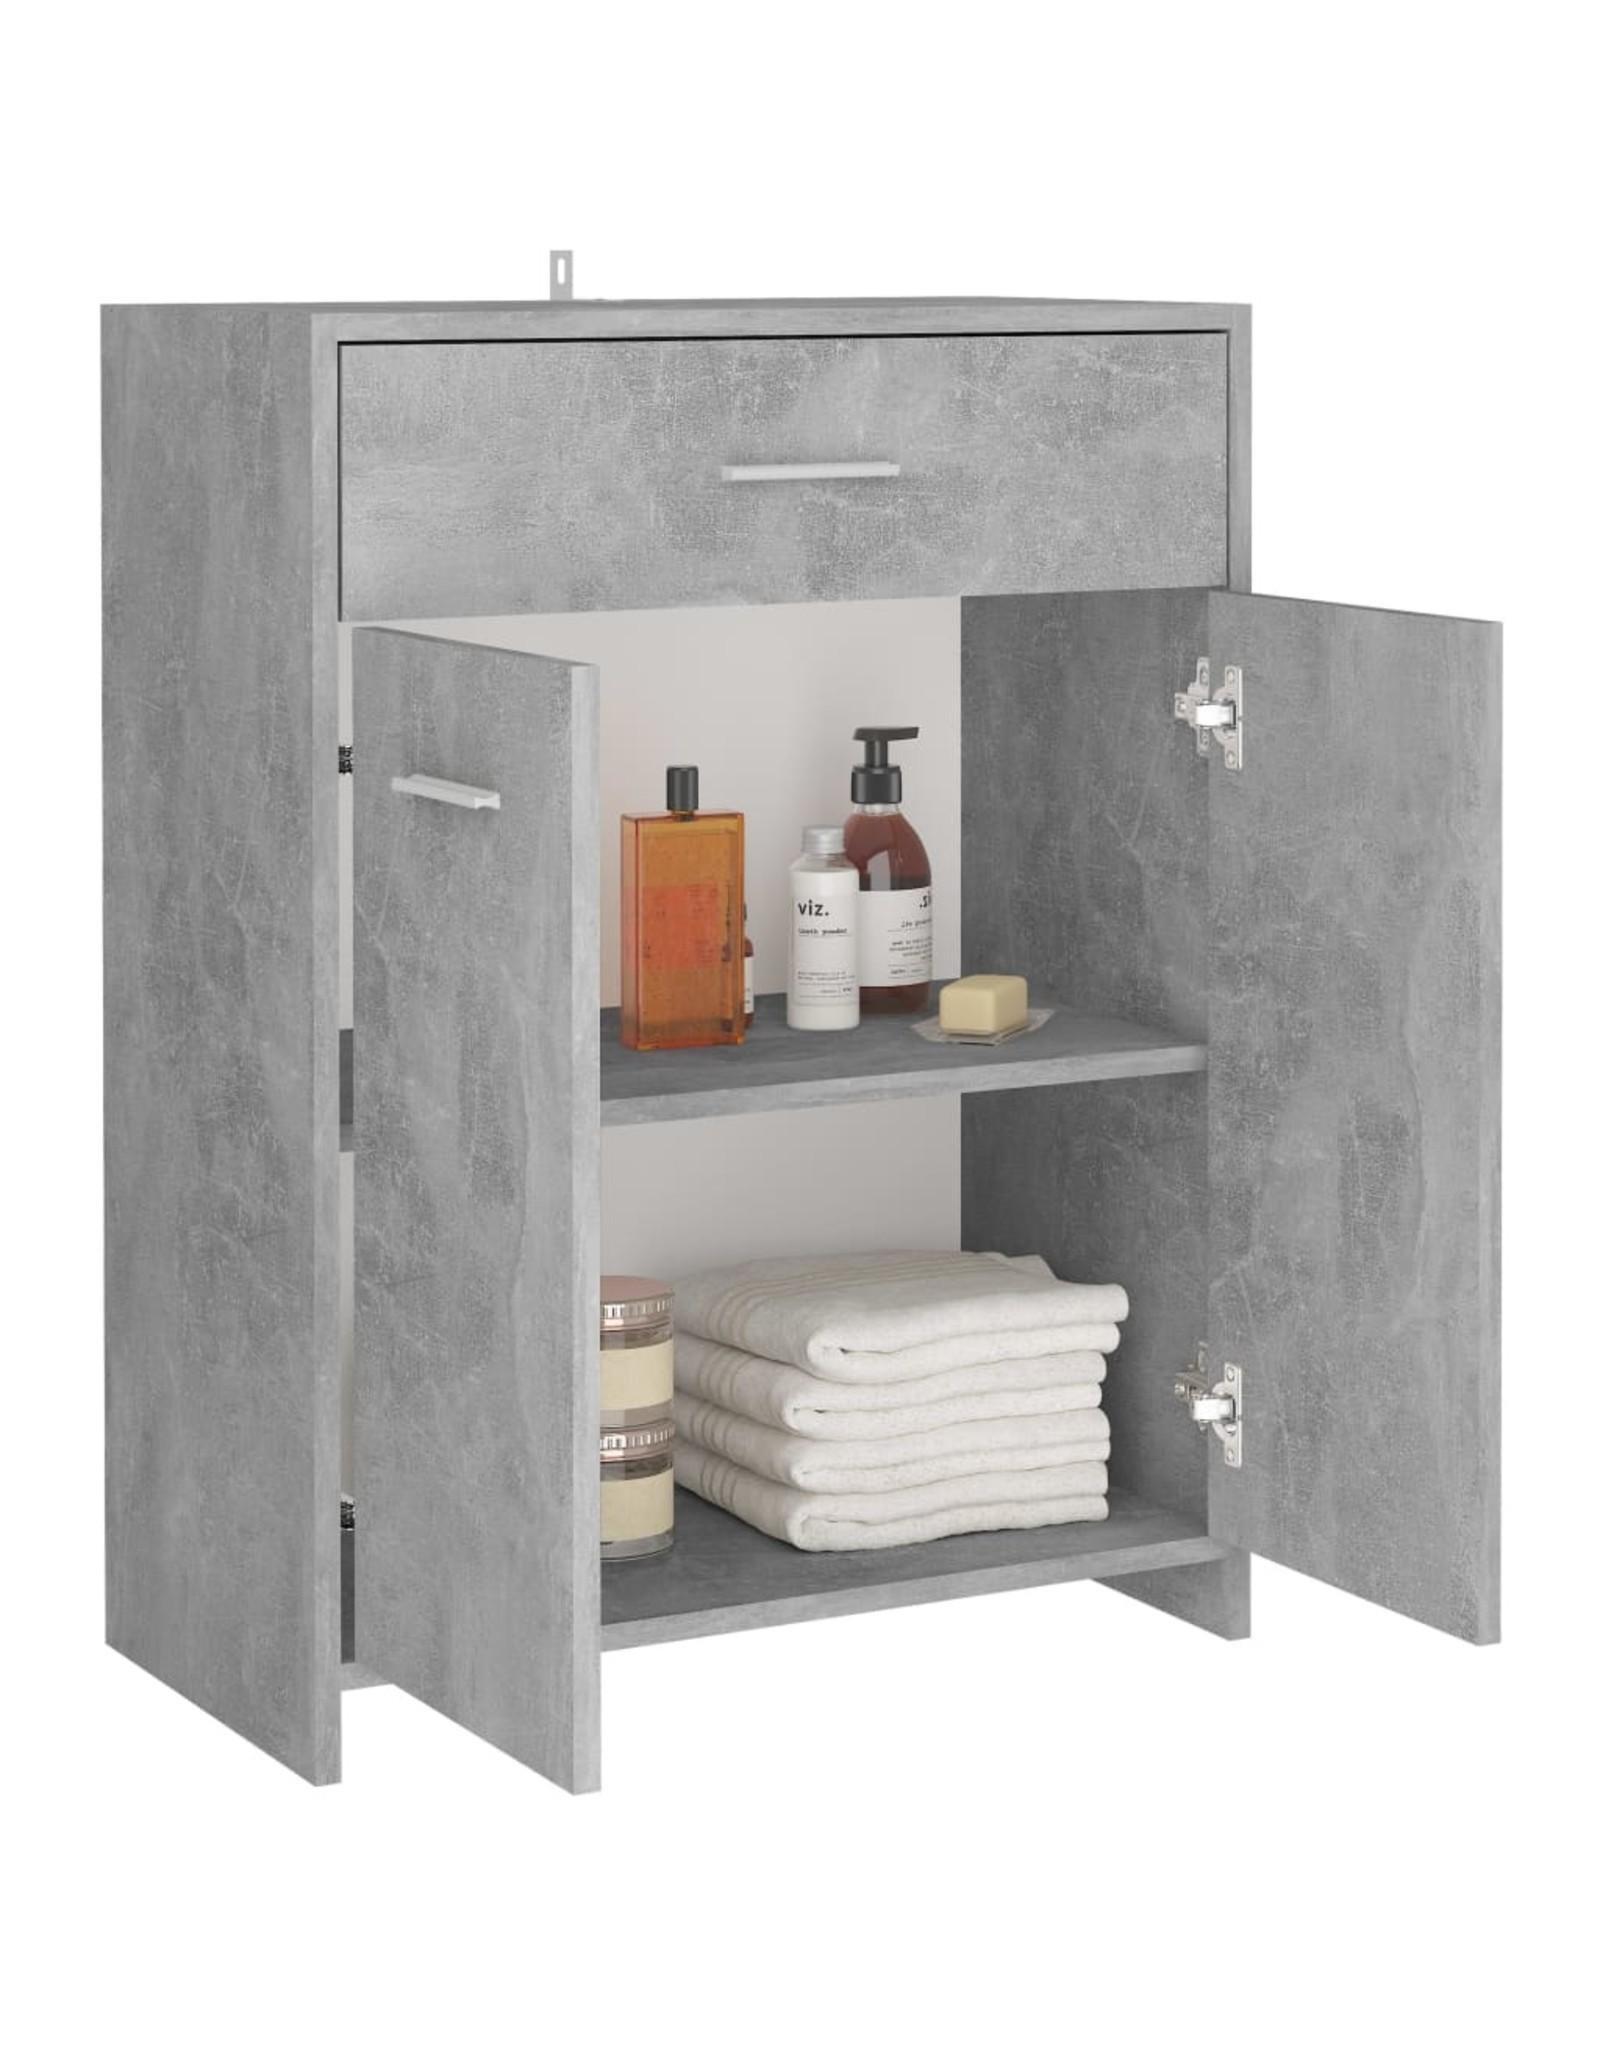 Badkamerkast 60x33x80 cm spaanplaat betongrijs